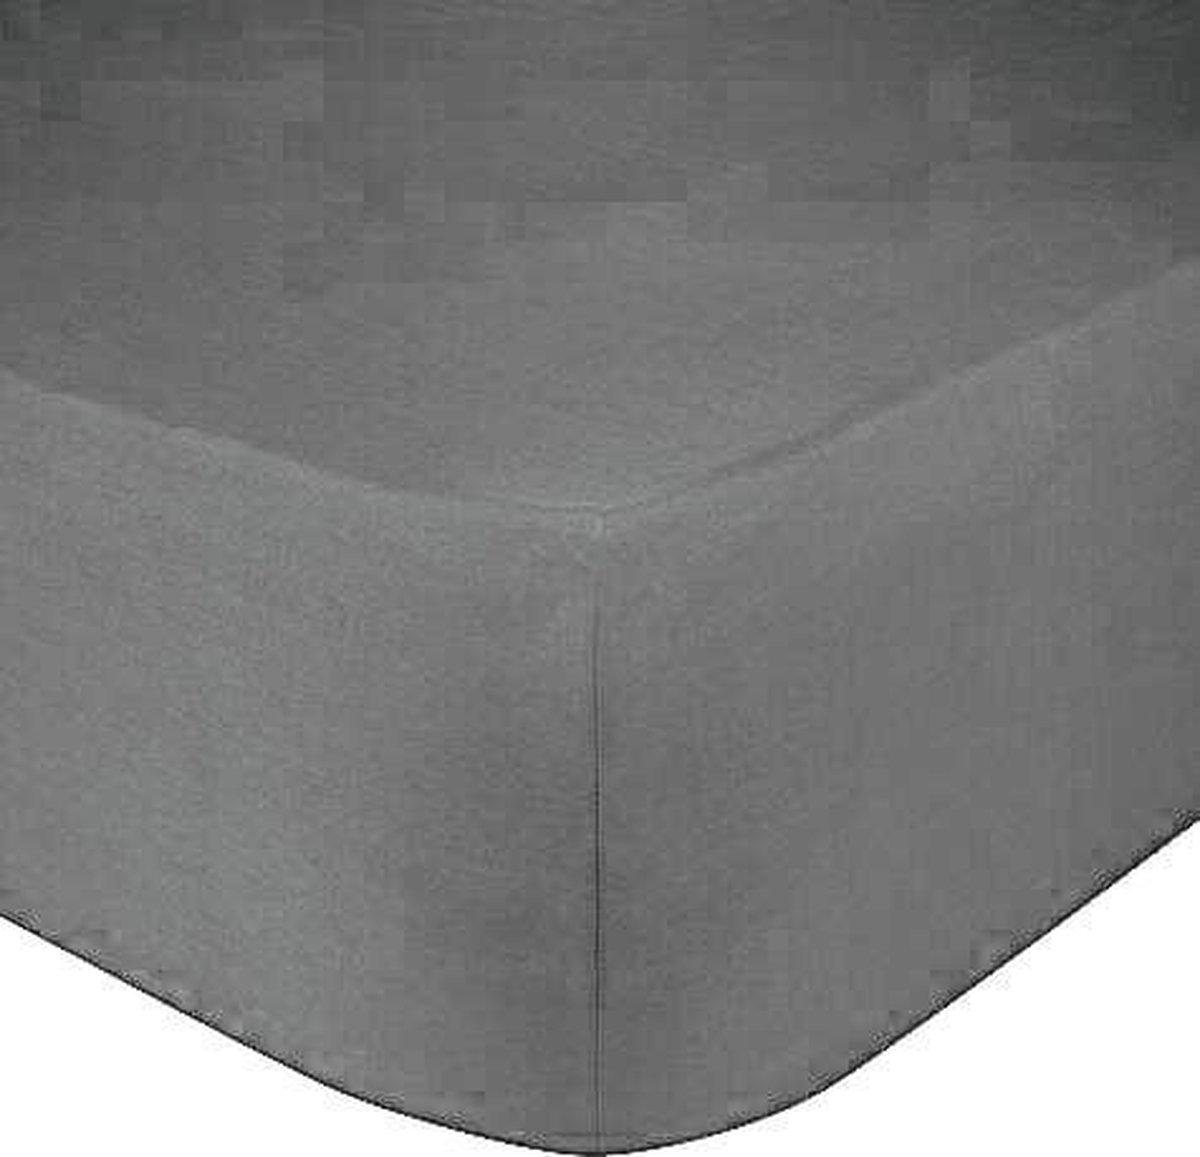 Het Ultieme Zachte Hoeslaken- Jersey -Stretch -100% Katoen-Lits-Jumeaux- 200x220+40cm- Antraciet  -